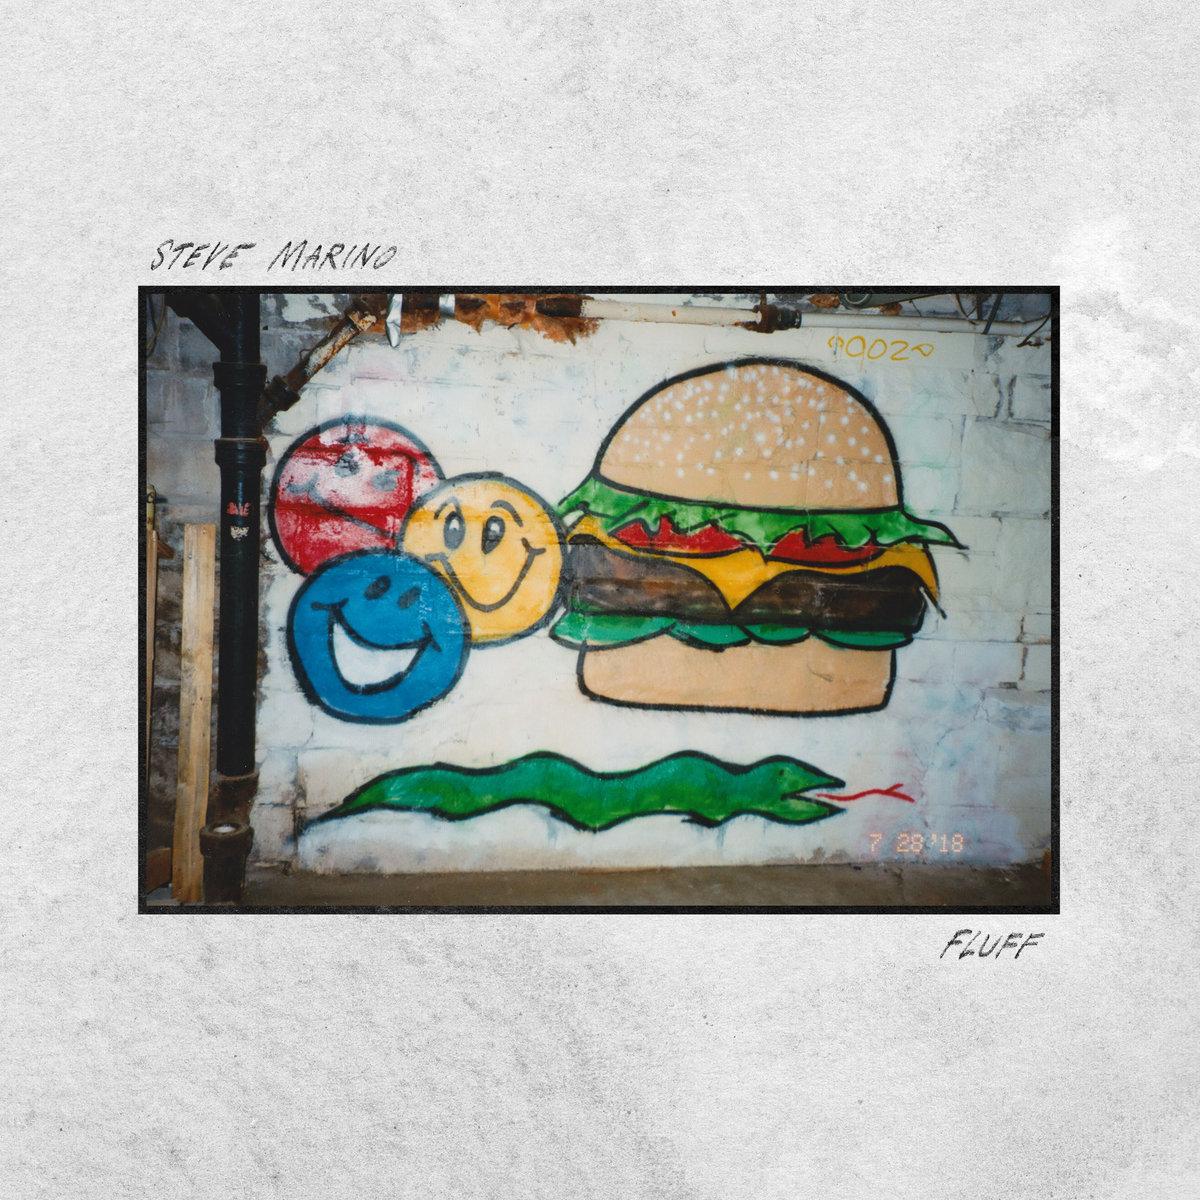 Copy of Steve Marino - Fluff LP